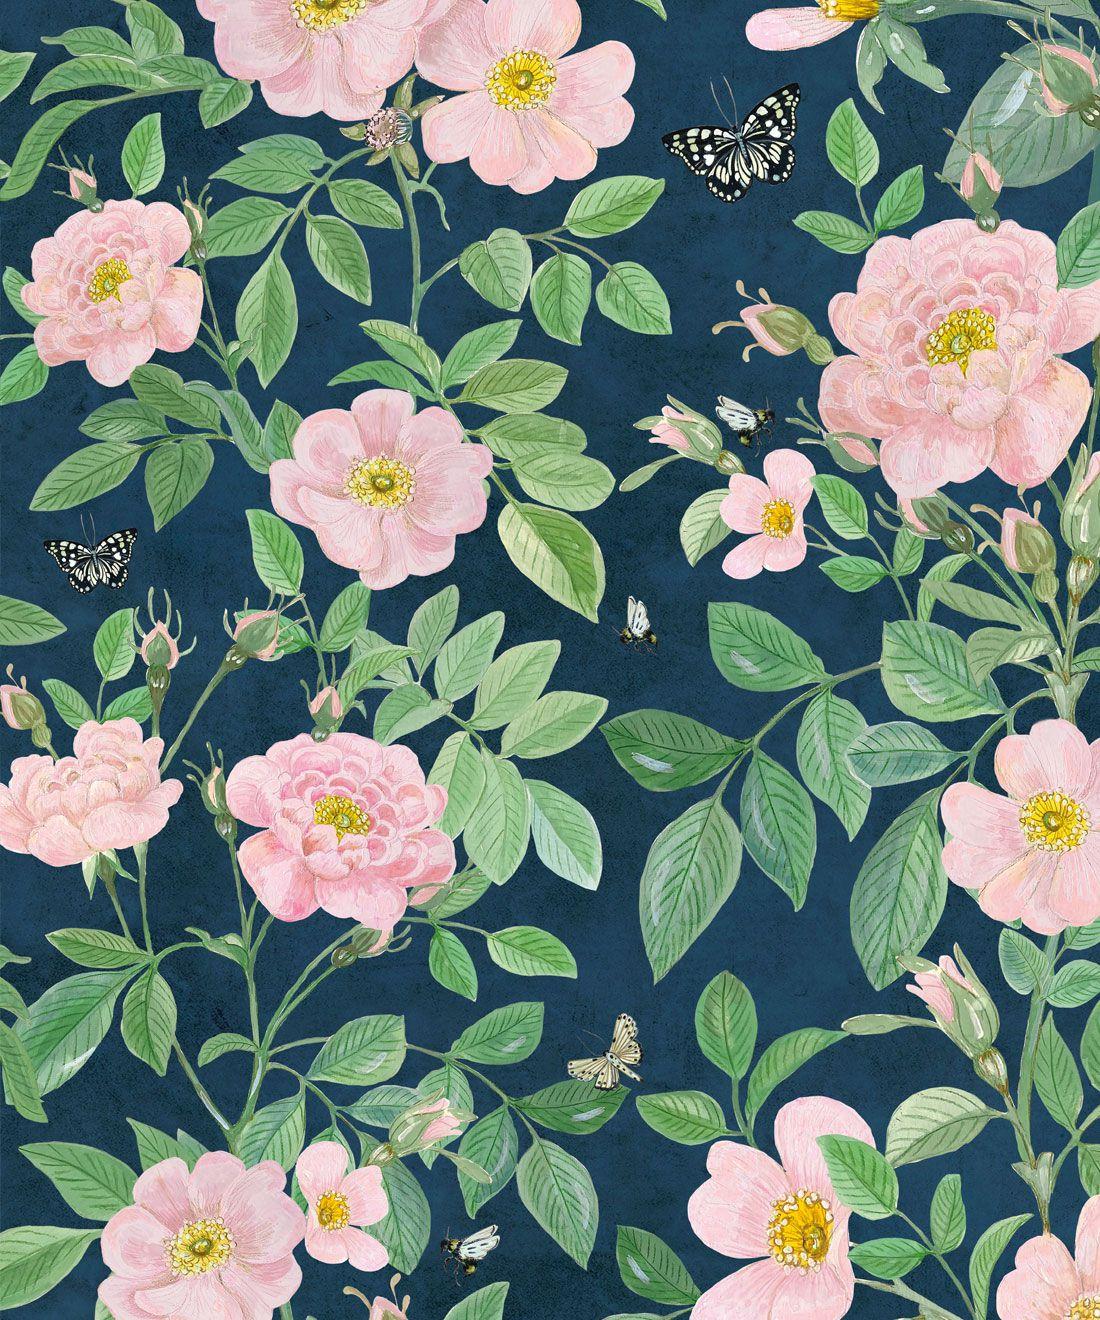 Rosa Wallpaper • Floral Wallpaper •Rose Pink • Swatch